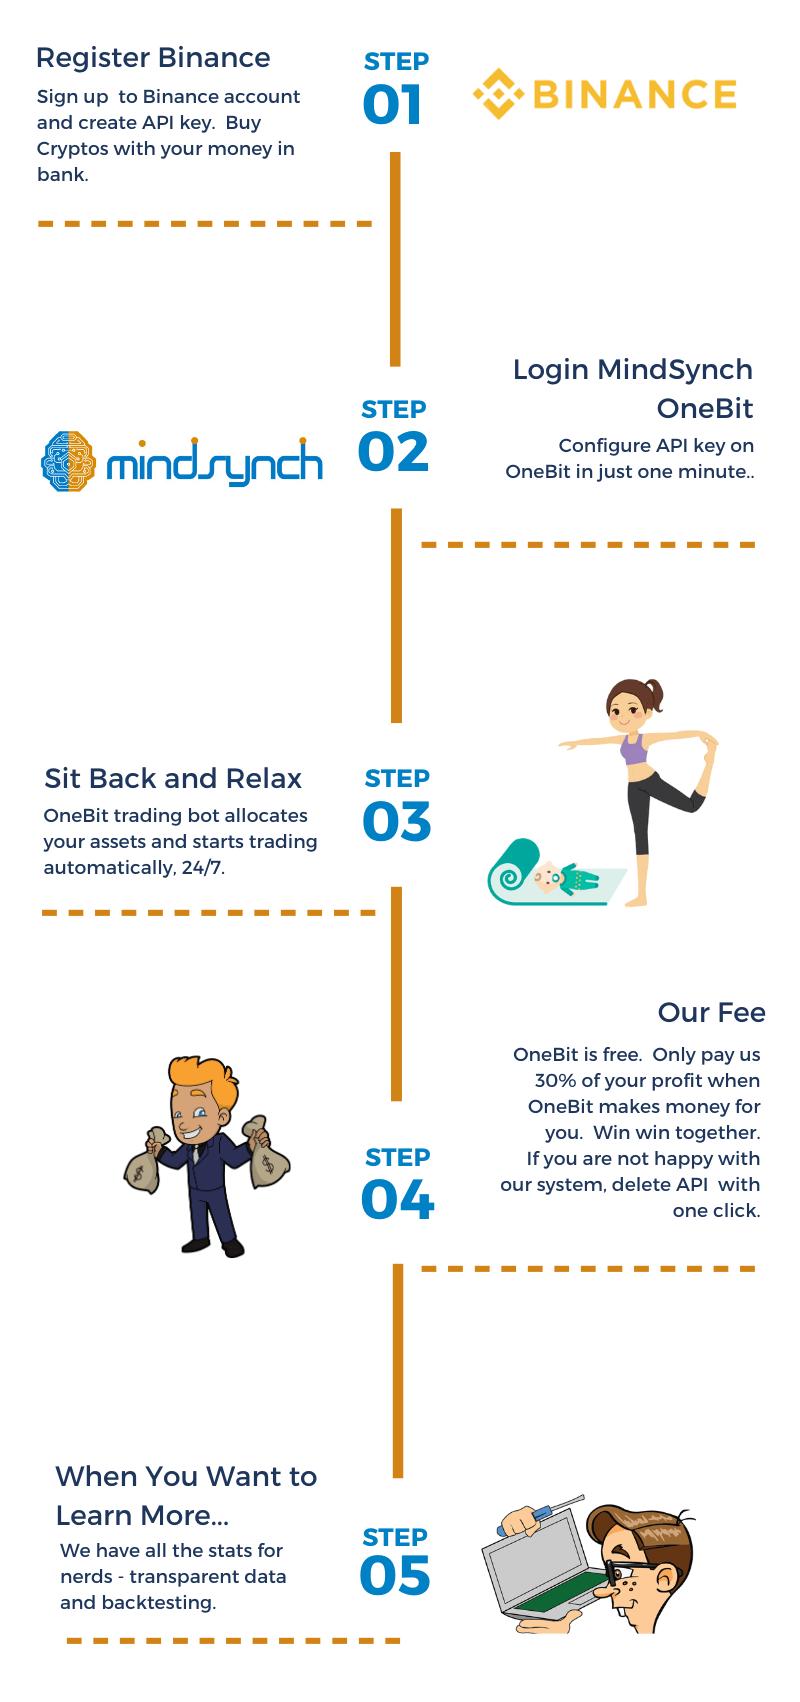 How it Works? - MindSynch OneBit